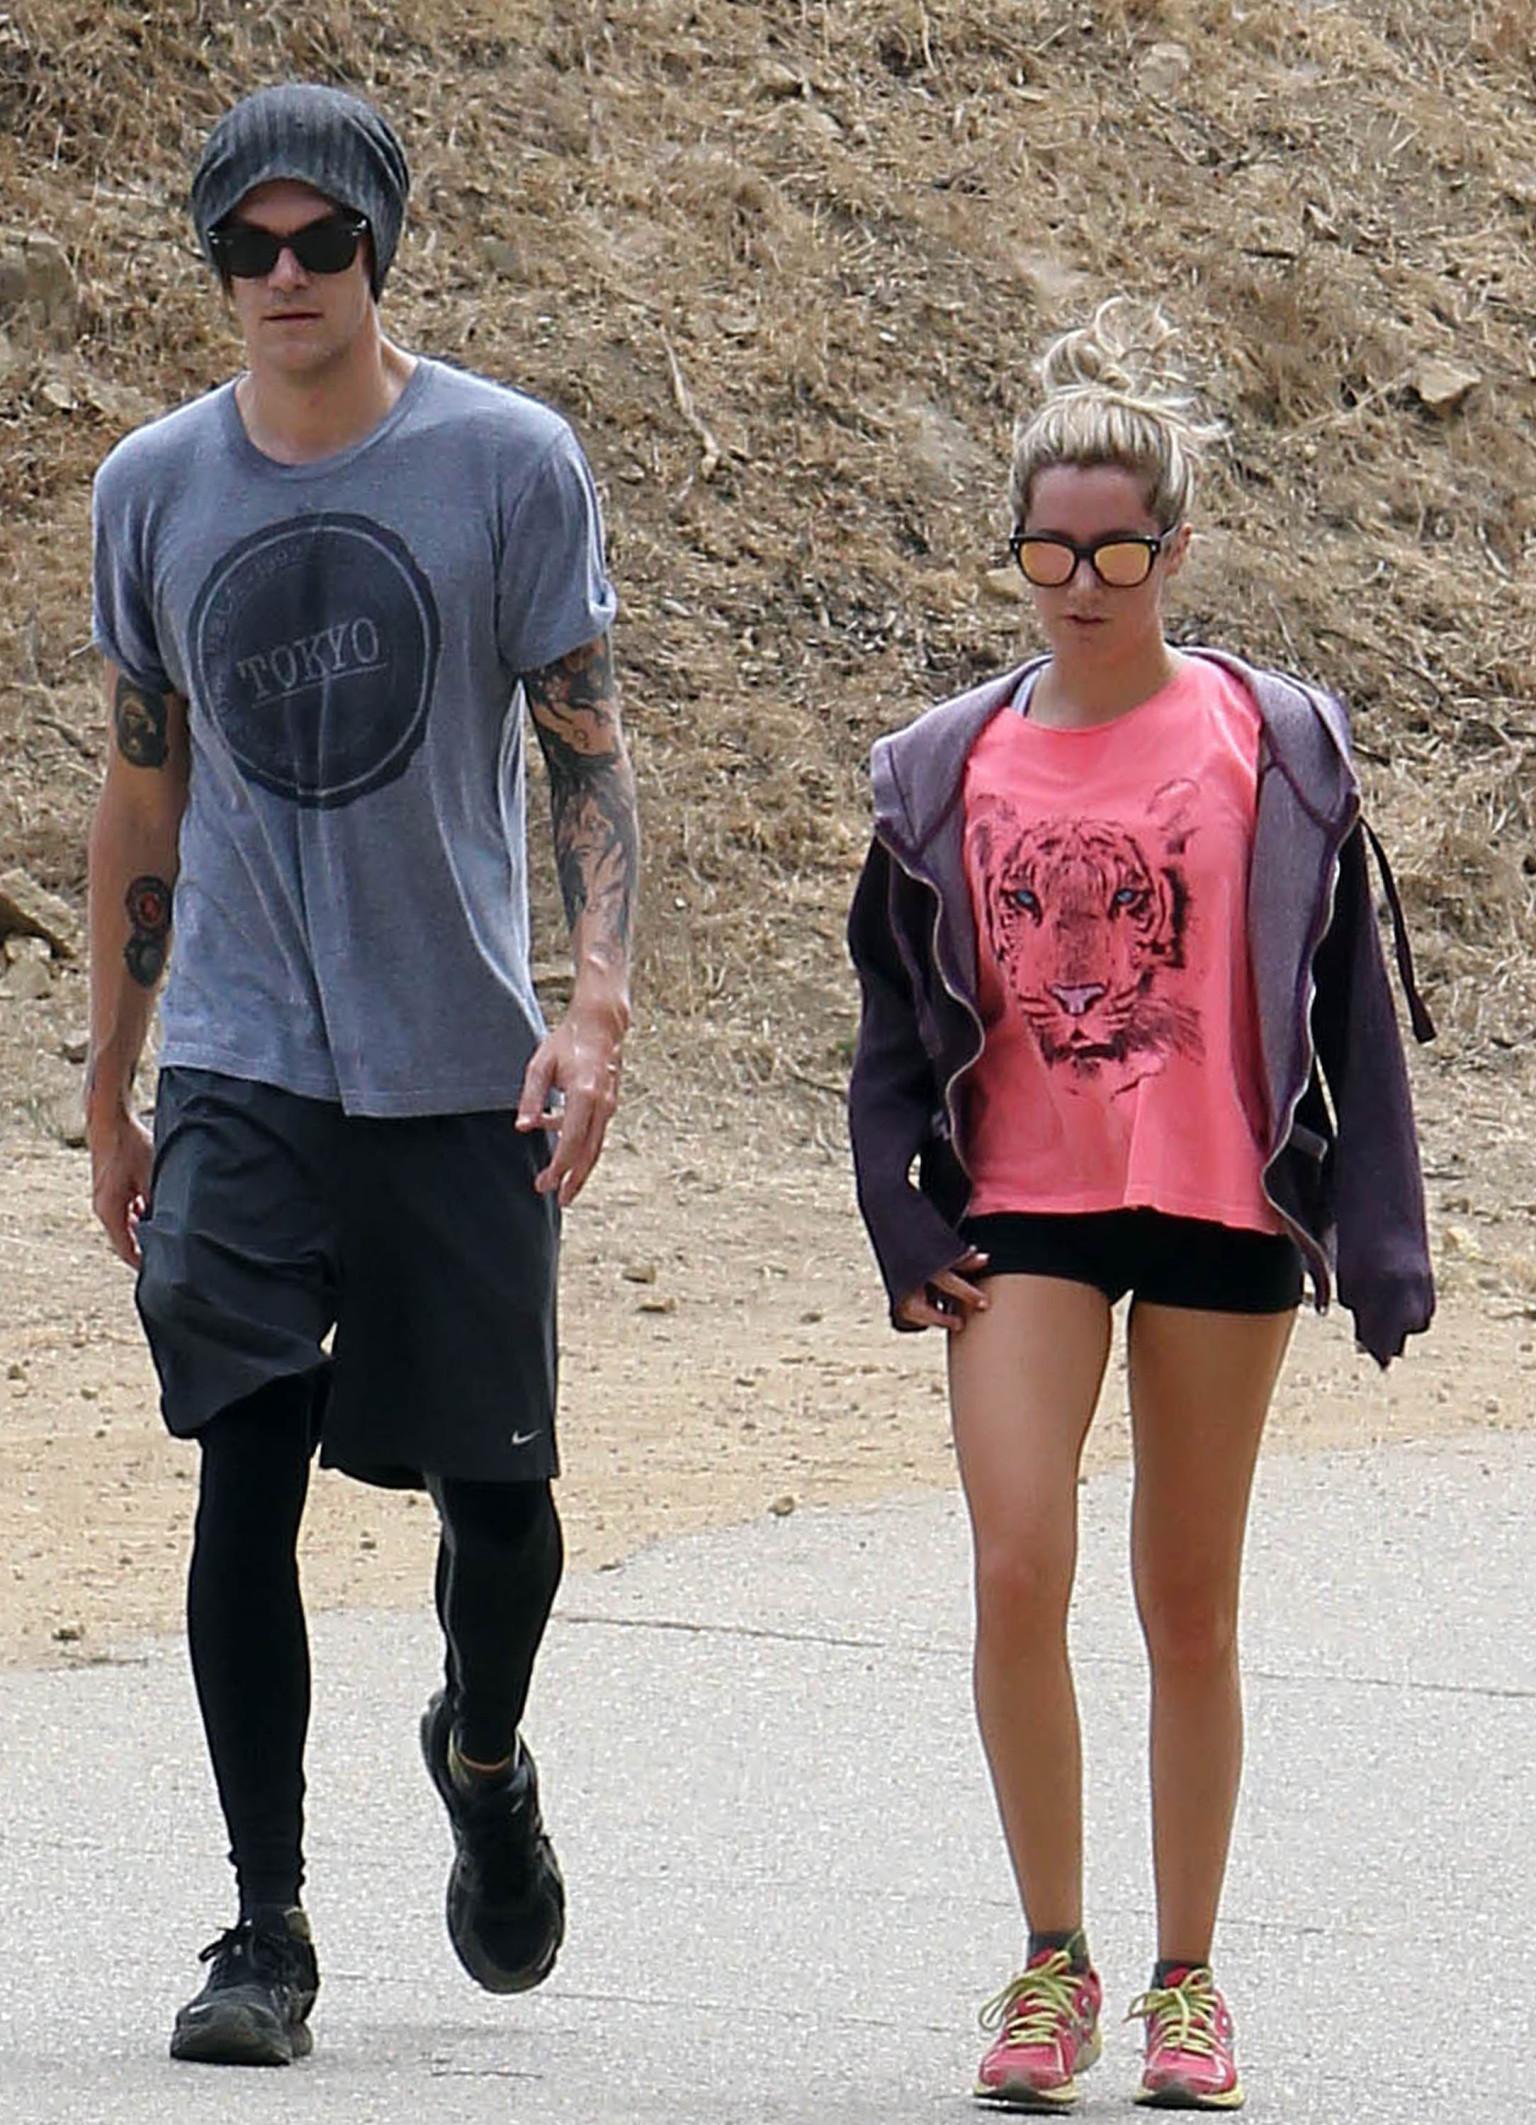 Ashley Tisdale Rocks Shorts While Hiking With Fiance